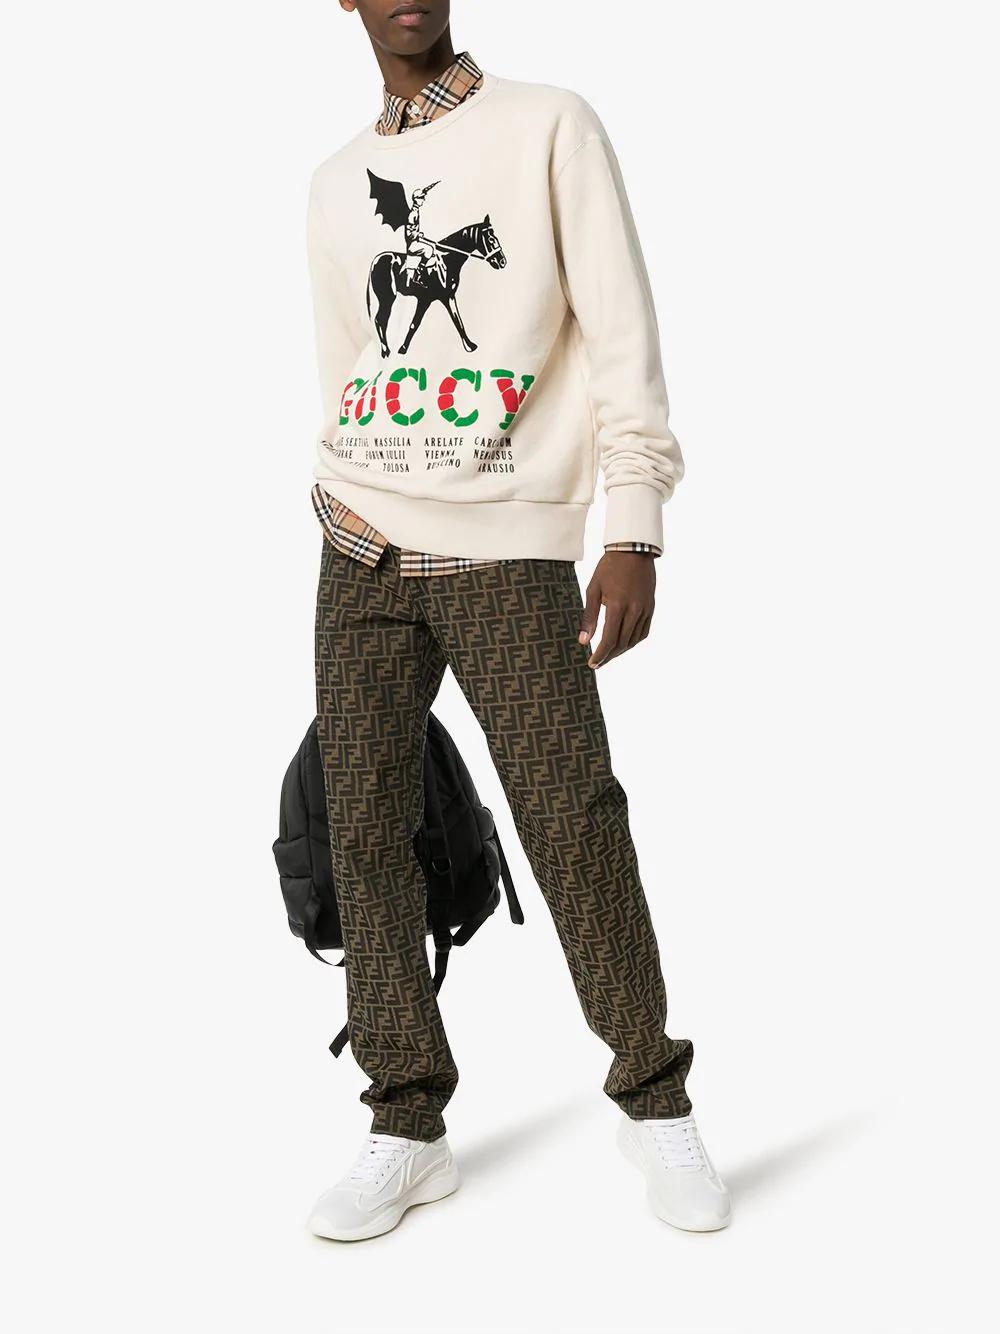 5ea3ea7cf65 Gucci Winged Jockey Guccy Jumper In 9230 Natural White  Multi